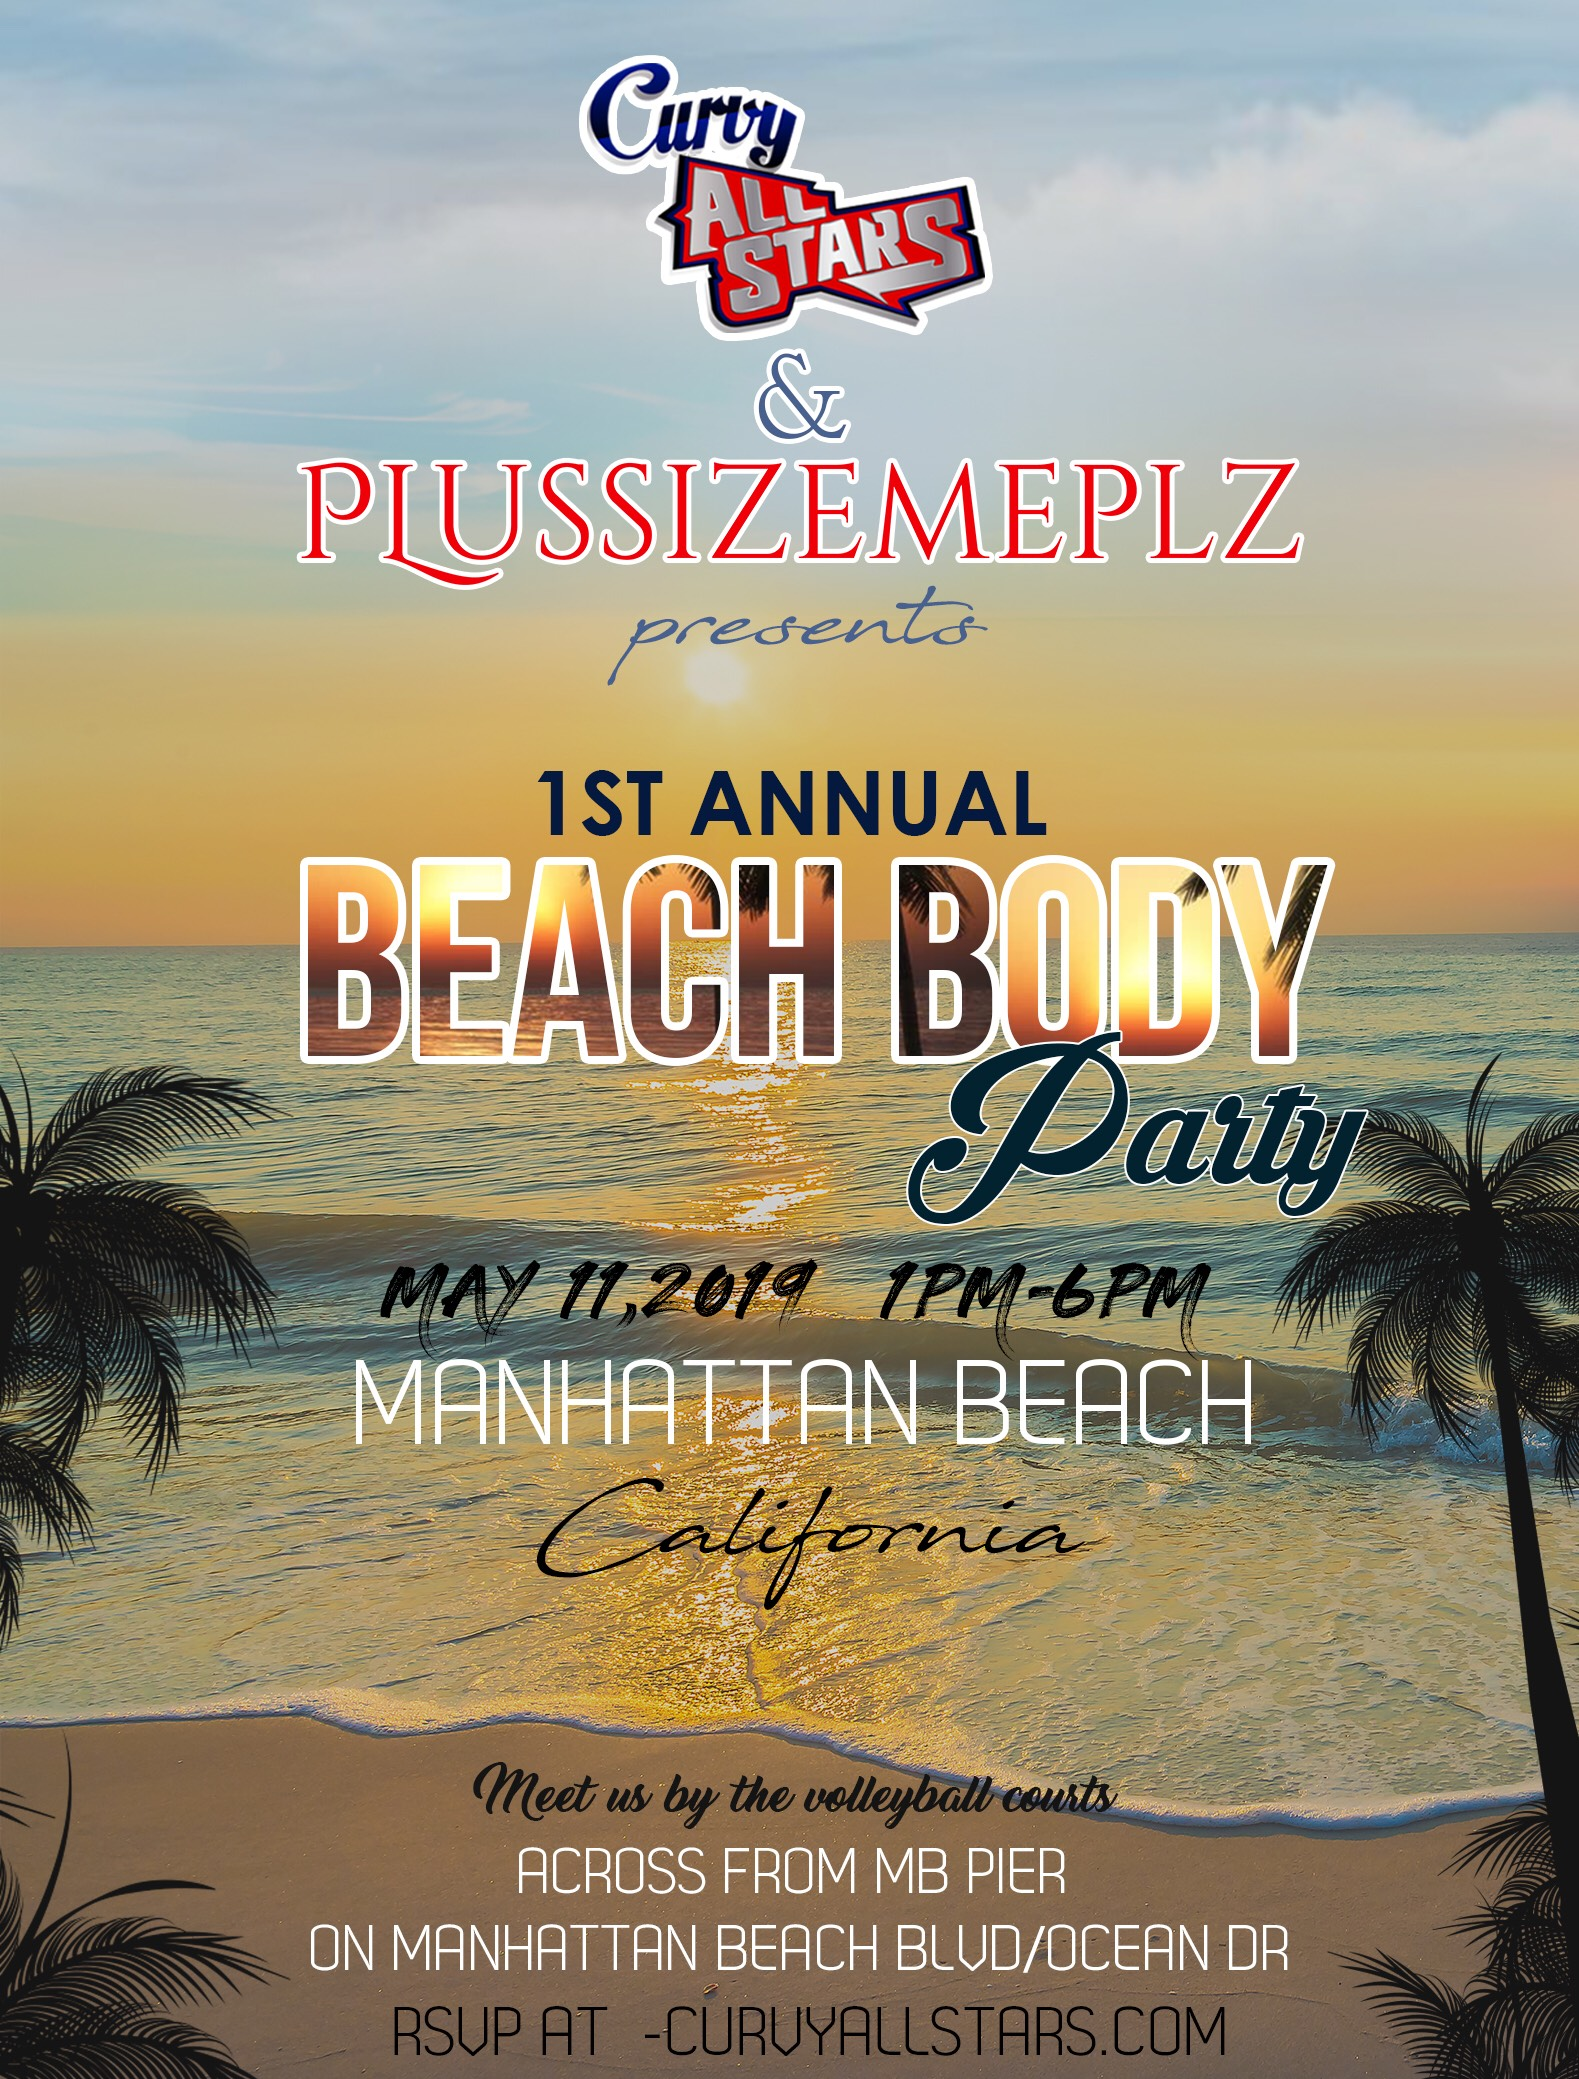 Beach BODY Party